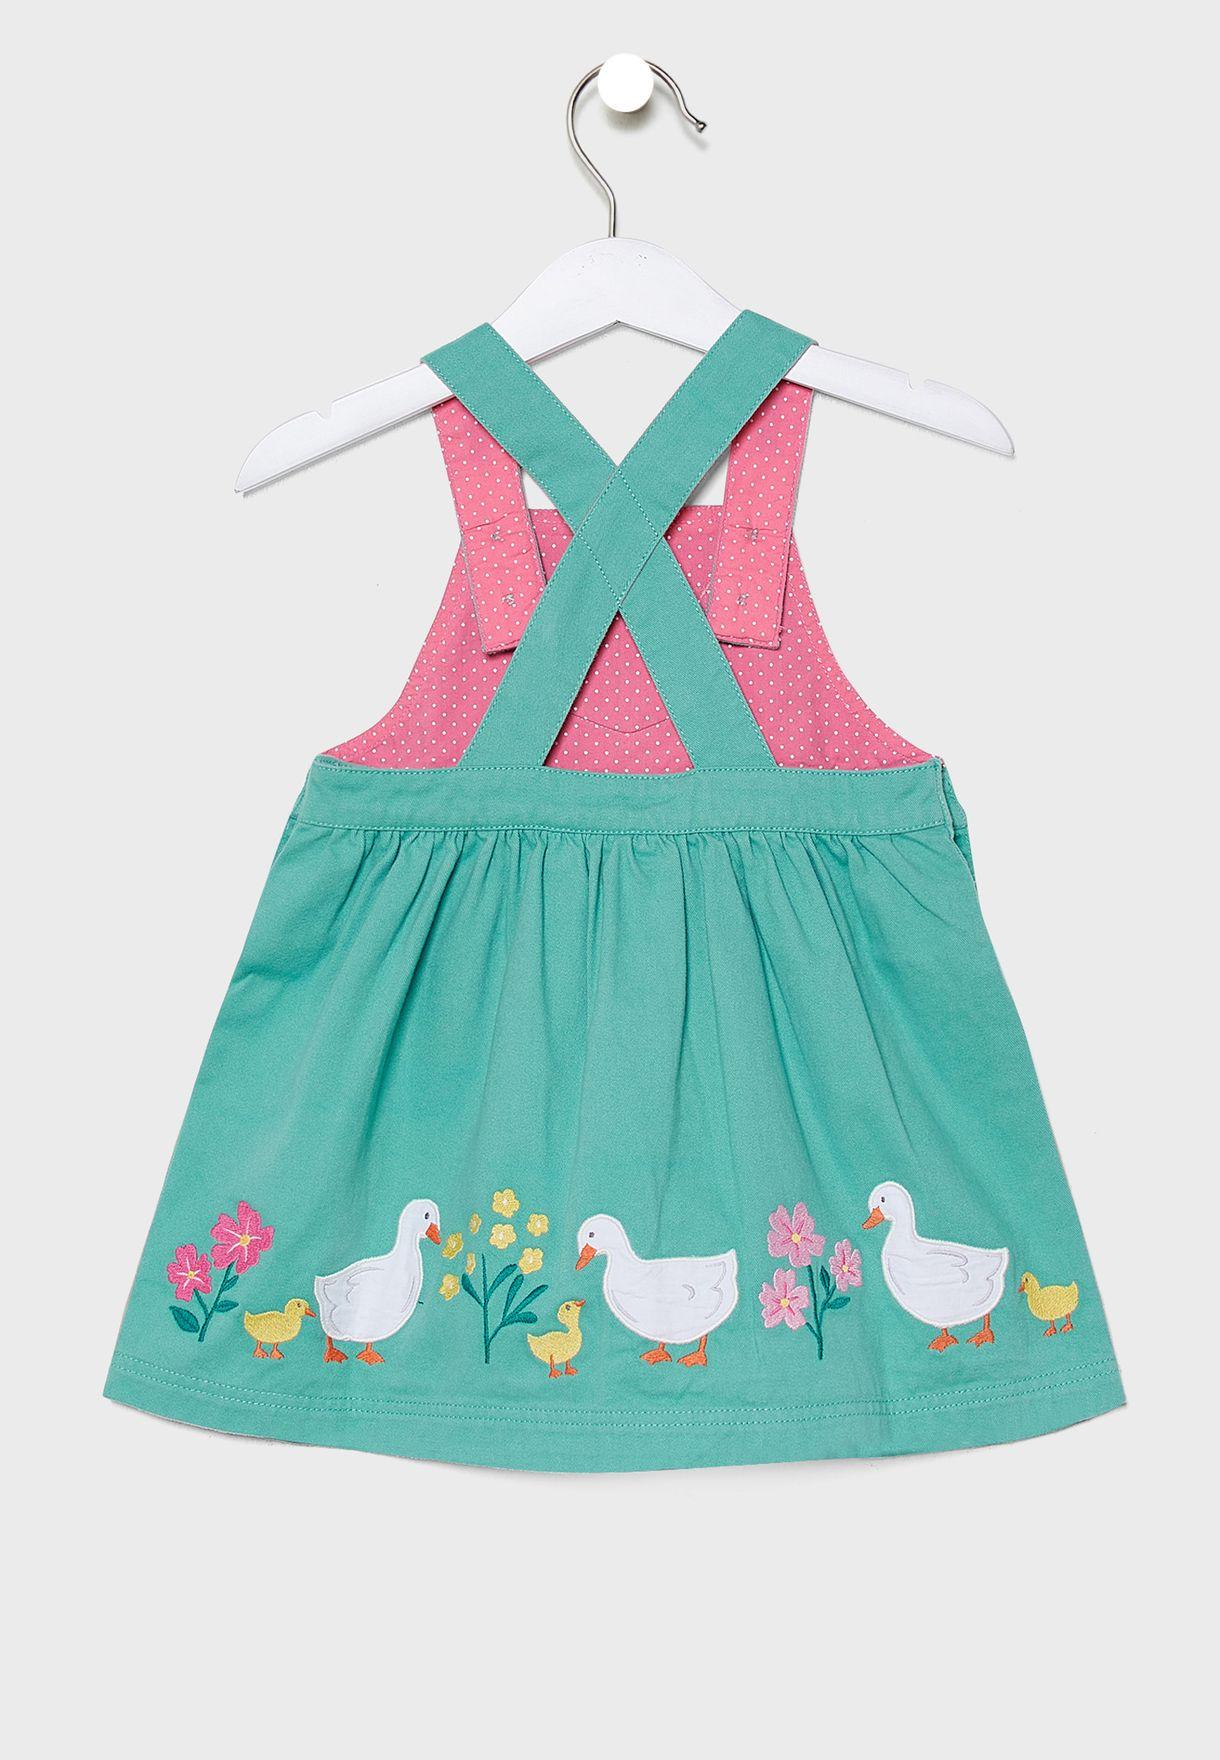 Kids Applique Pinafore Dress